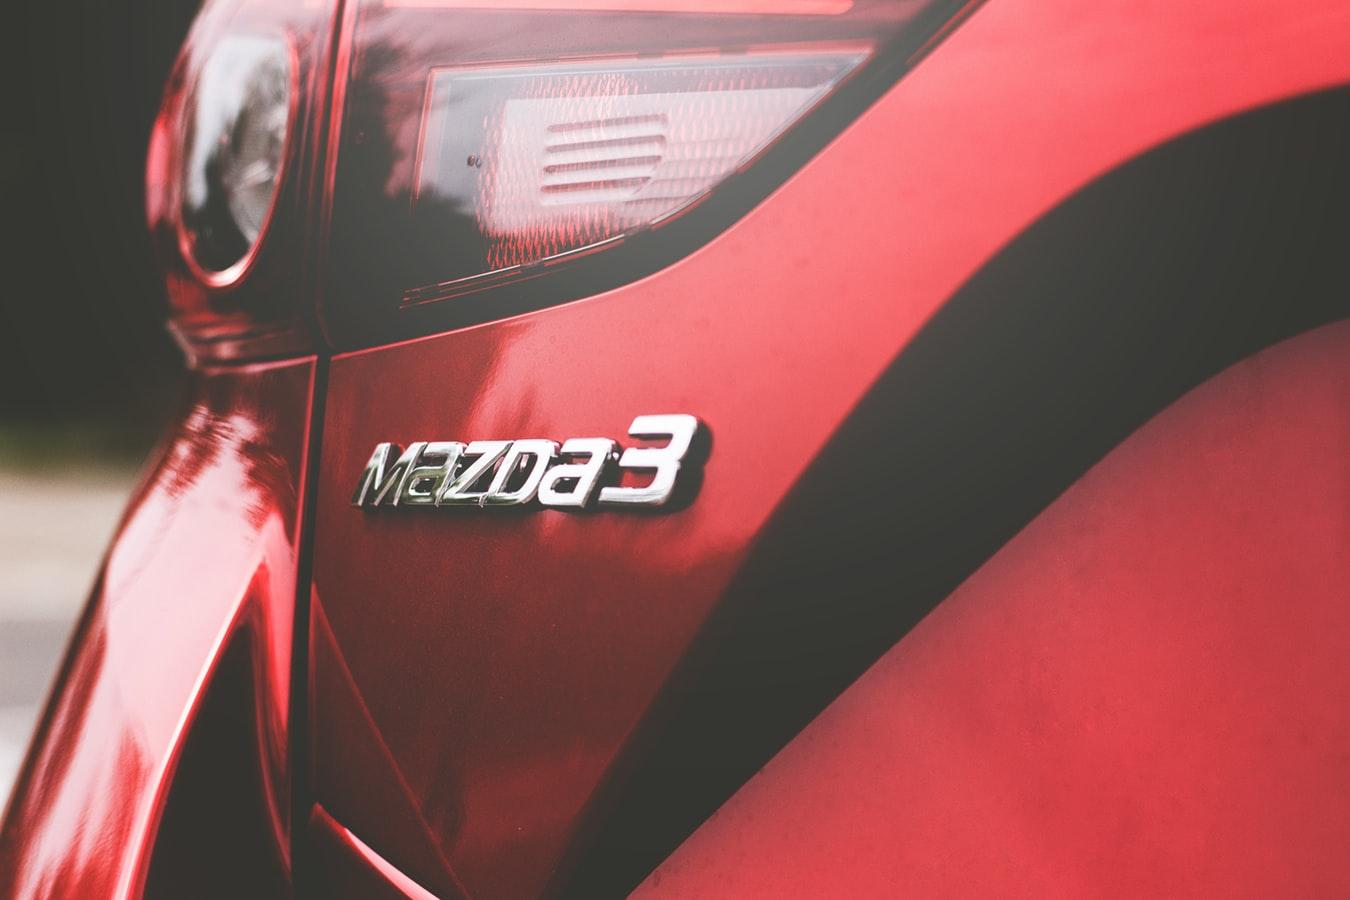 Red Mazda 3 car badge